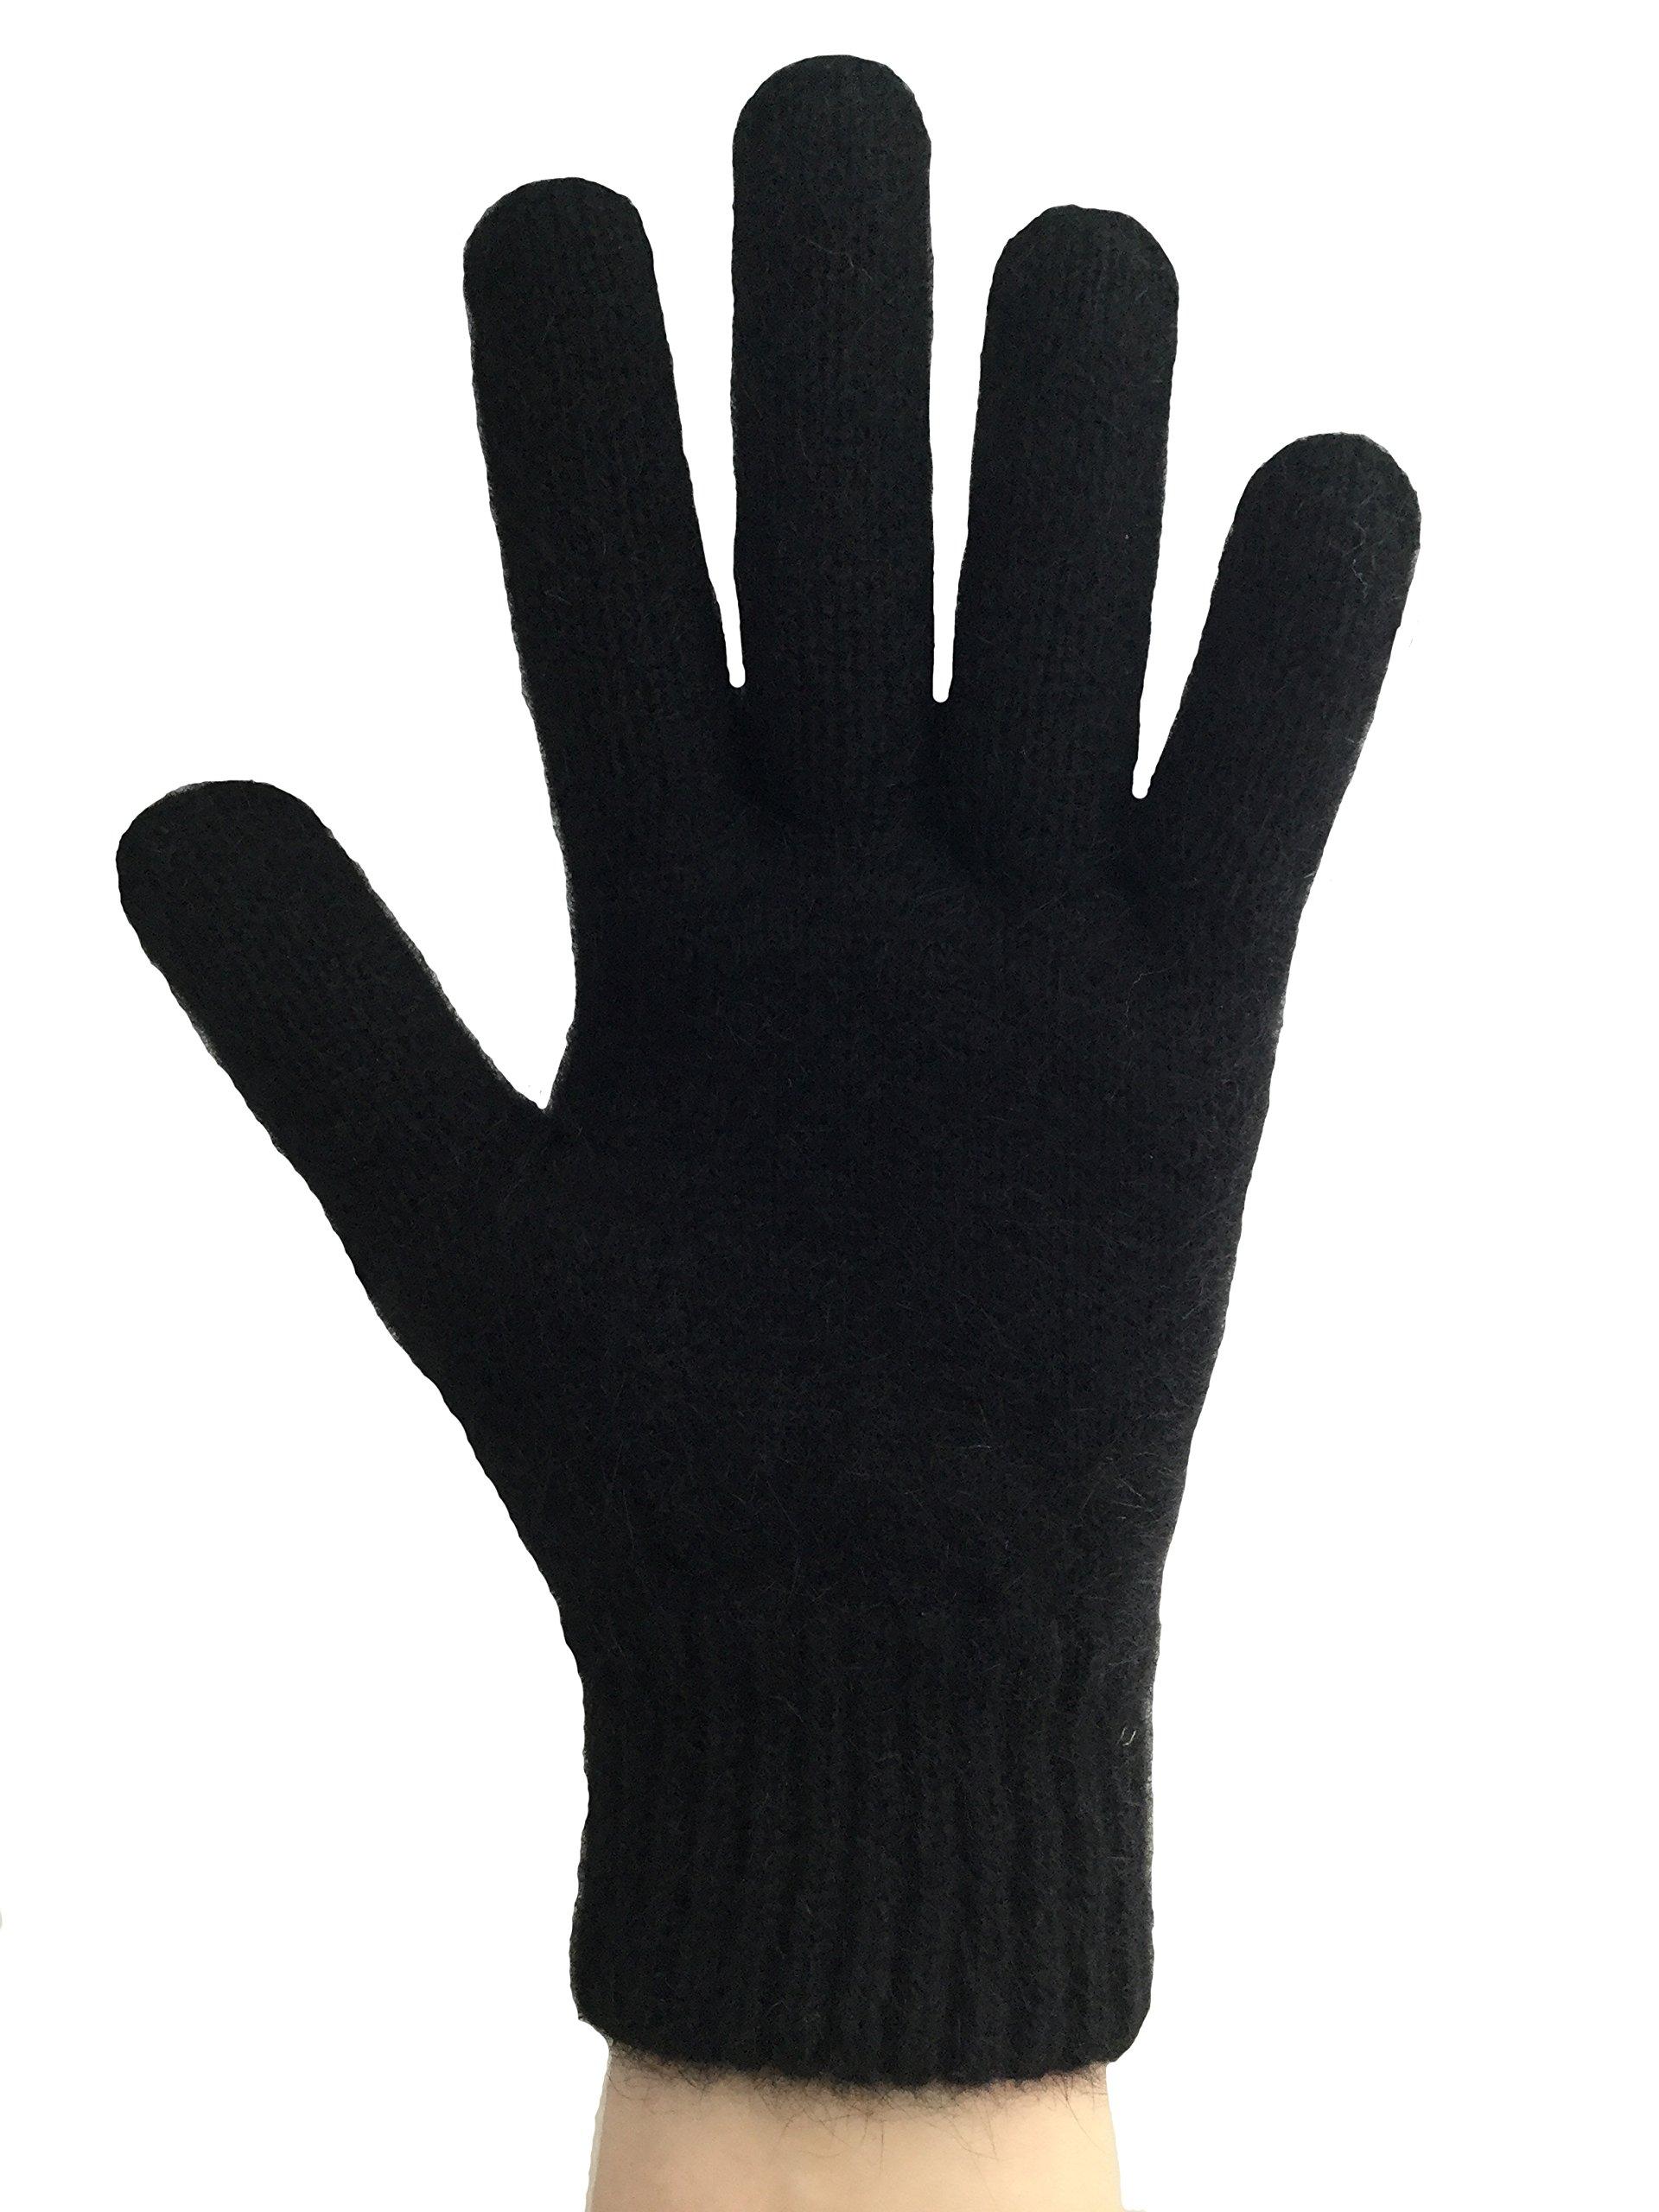 PossumDown Lightweight Brushtail Possum Merino Wool Blend Gloves (XLarge, Black)